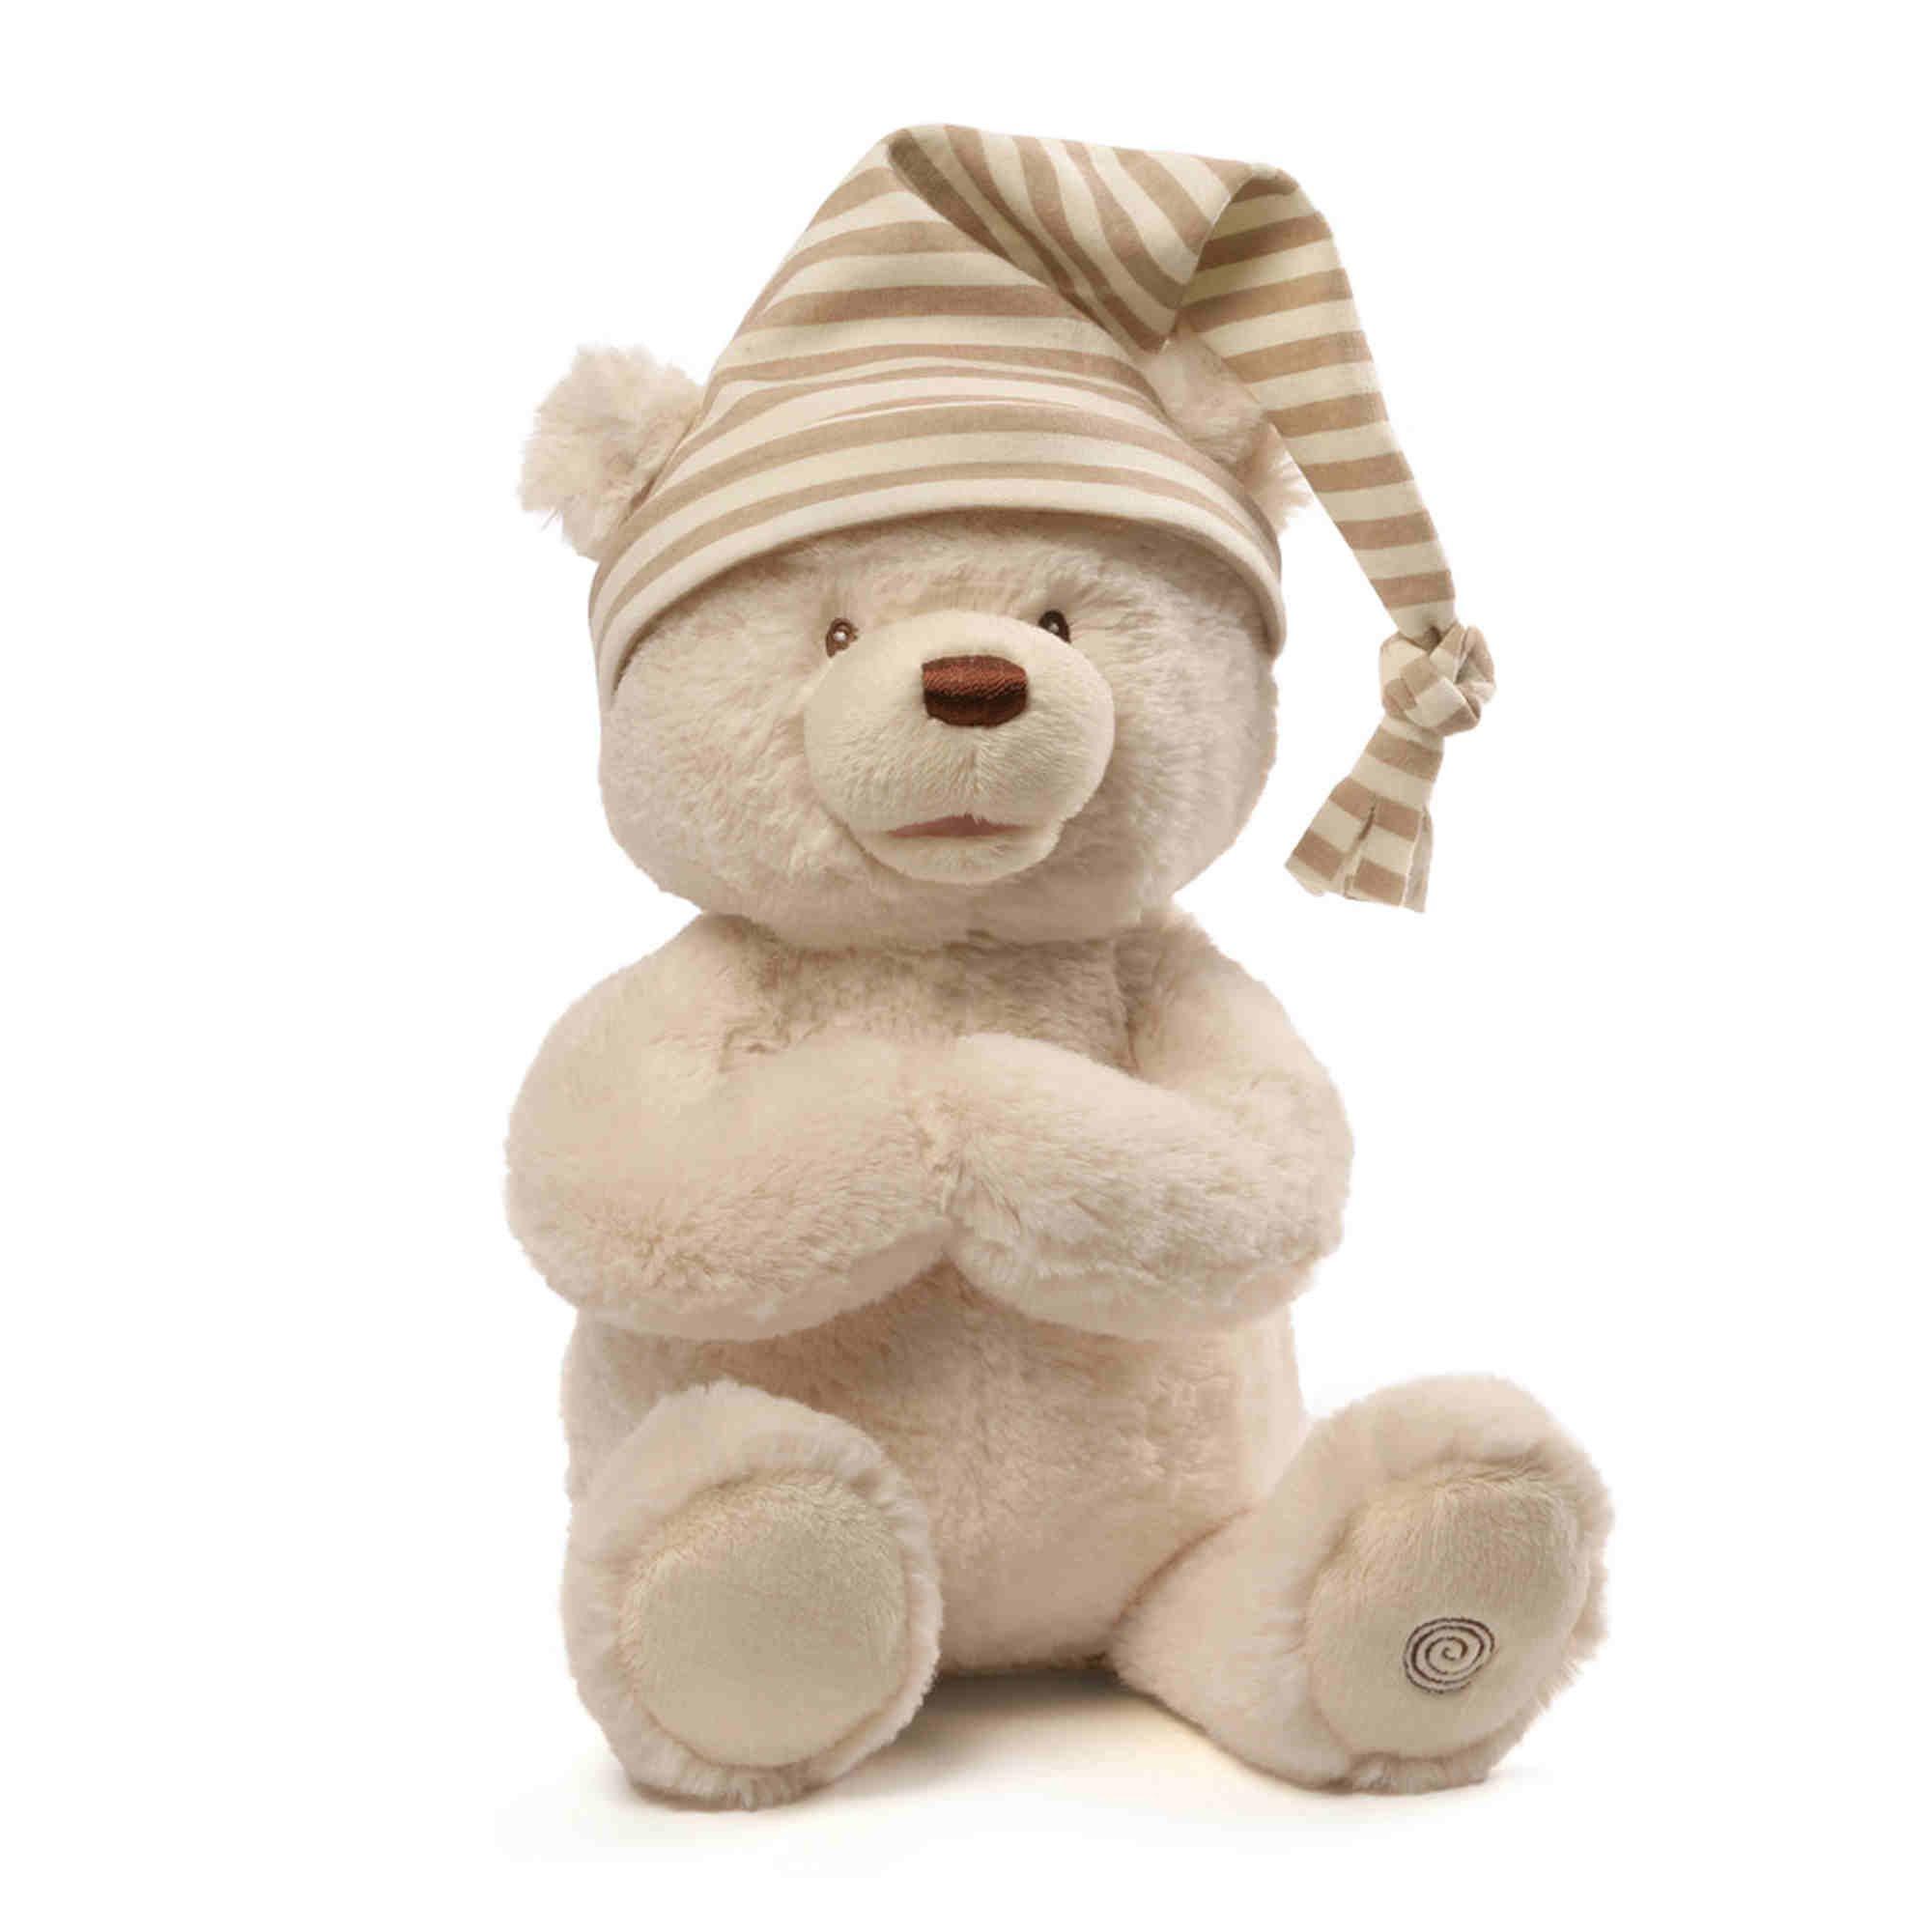 GUND Animated Goodnight Prayer Bear Spiritual Plush Stuffed Animal, 15'' by GUND